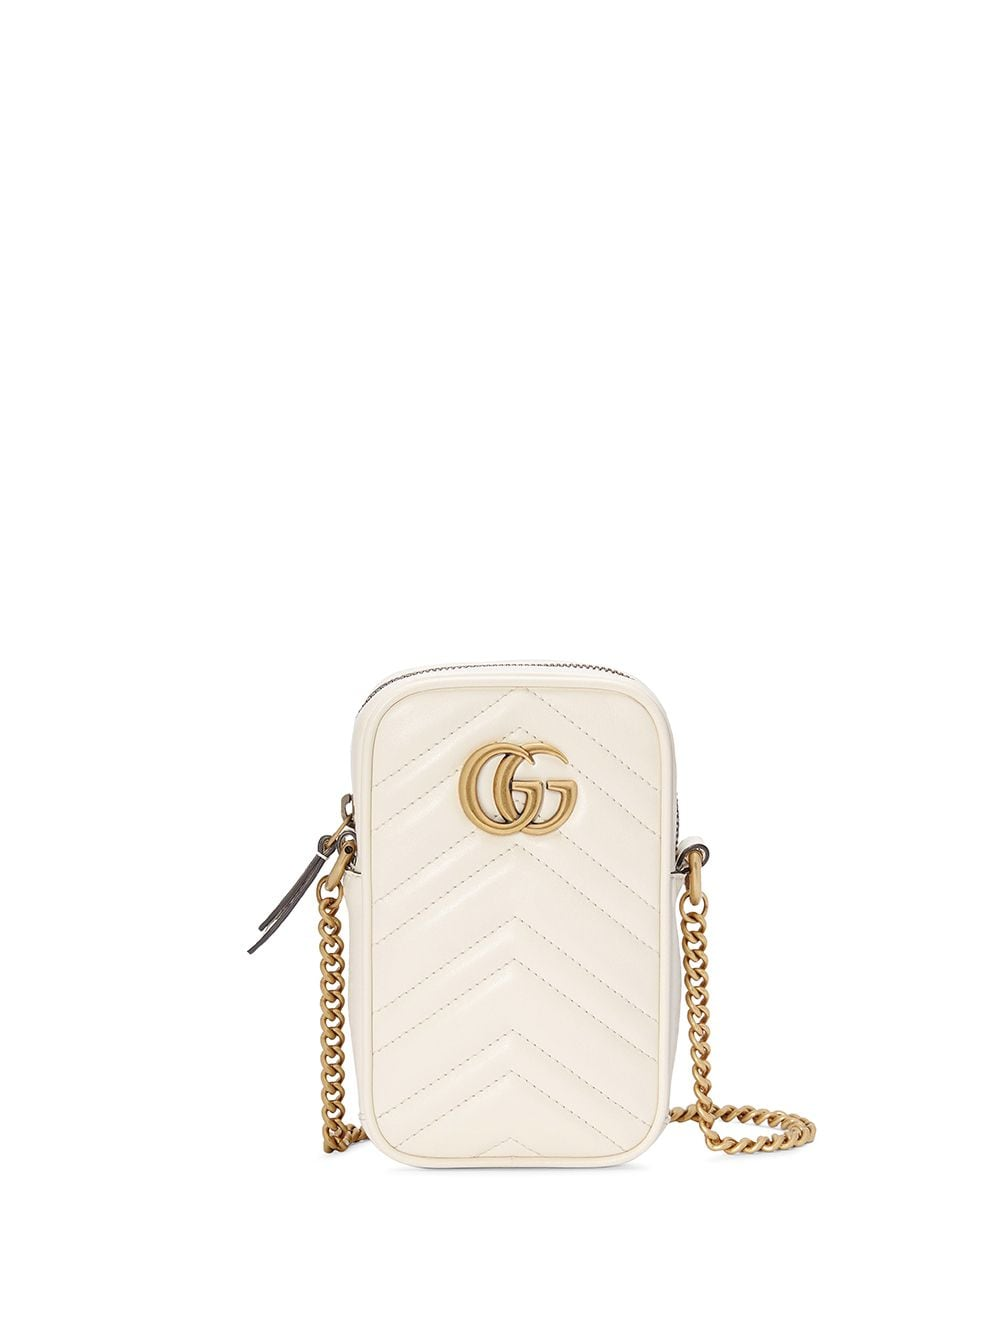 Gg Marmont Leather Mini Bag